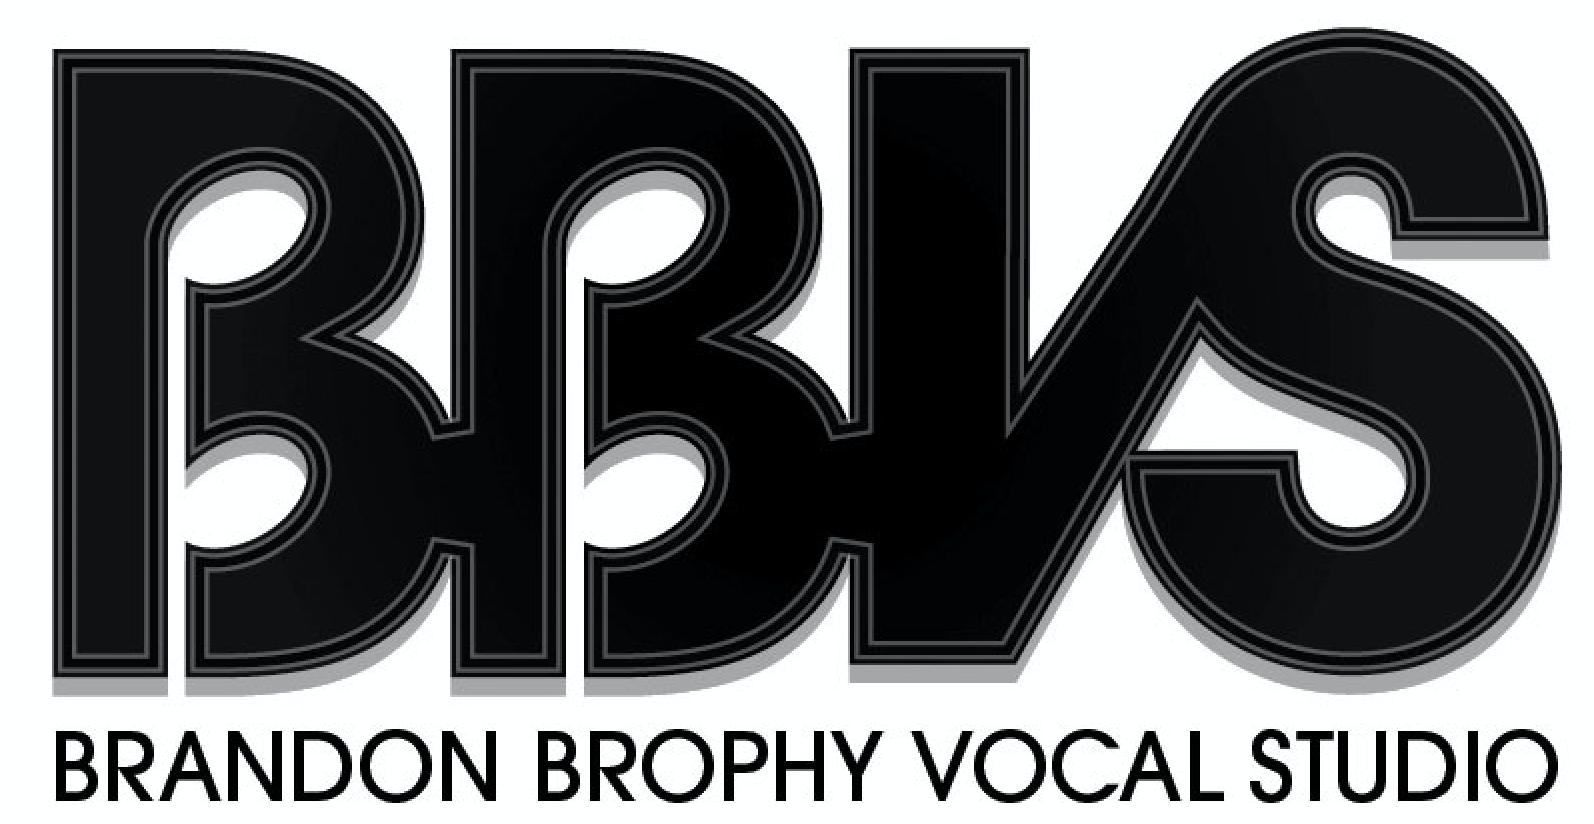 BBVS – Brandon Brophy Vocal Studios